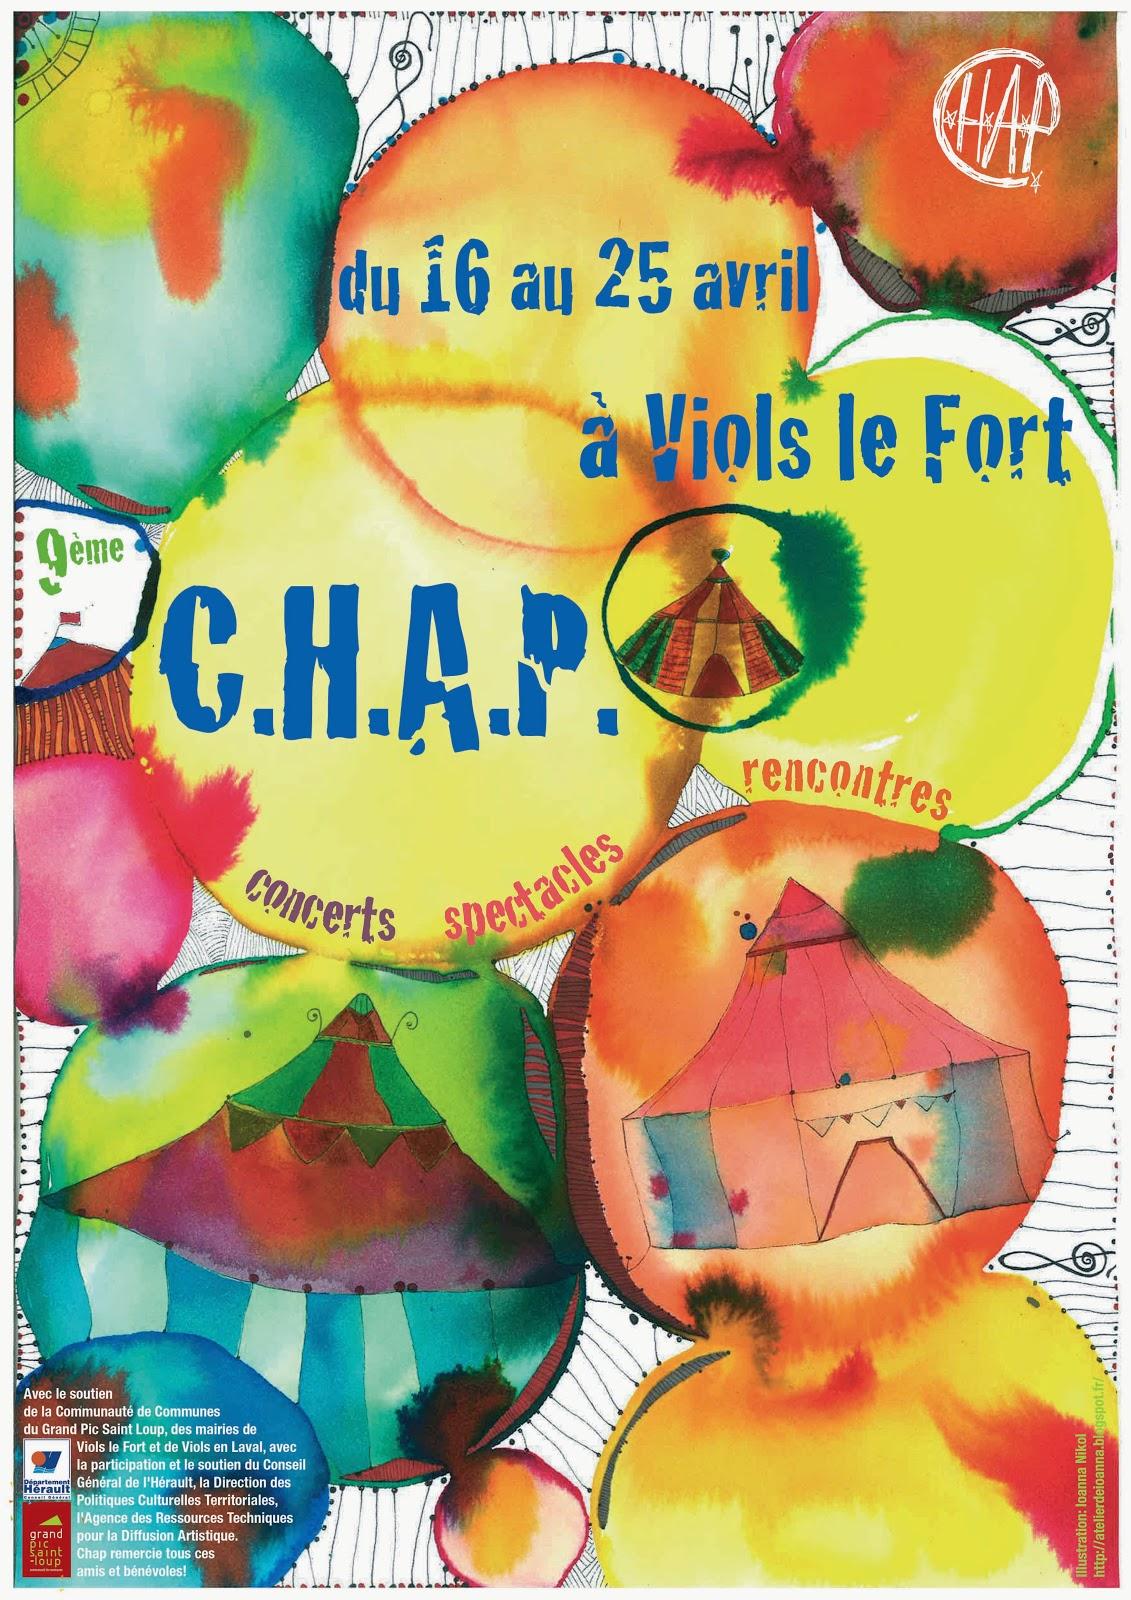 http://www.chap-festival.com/